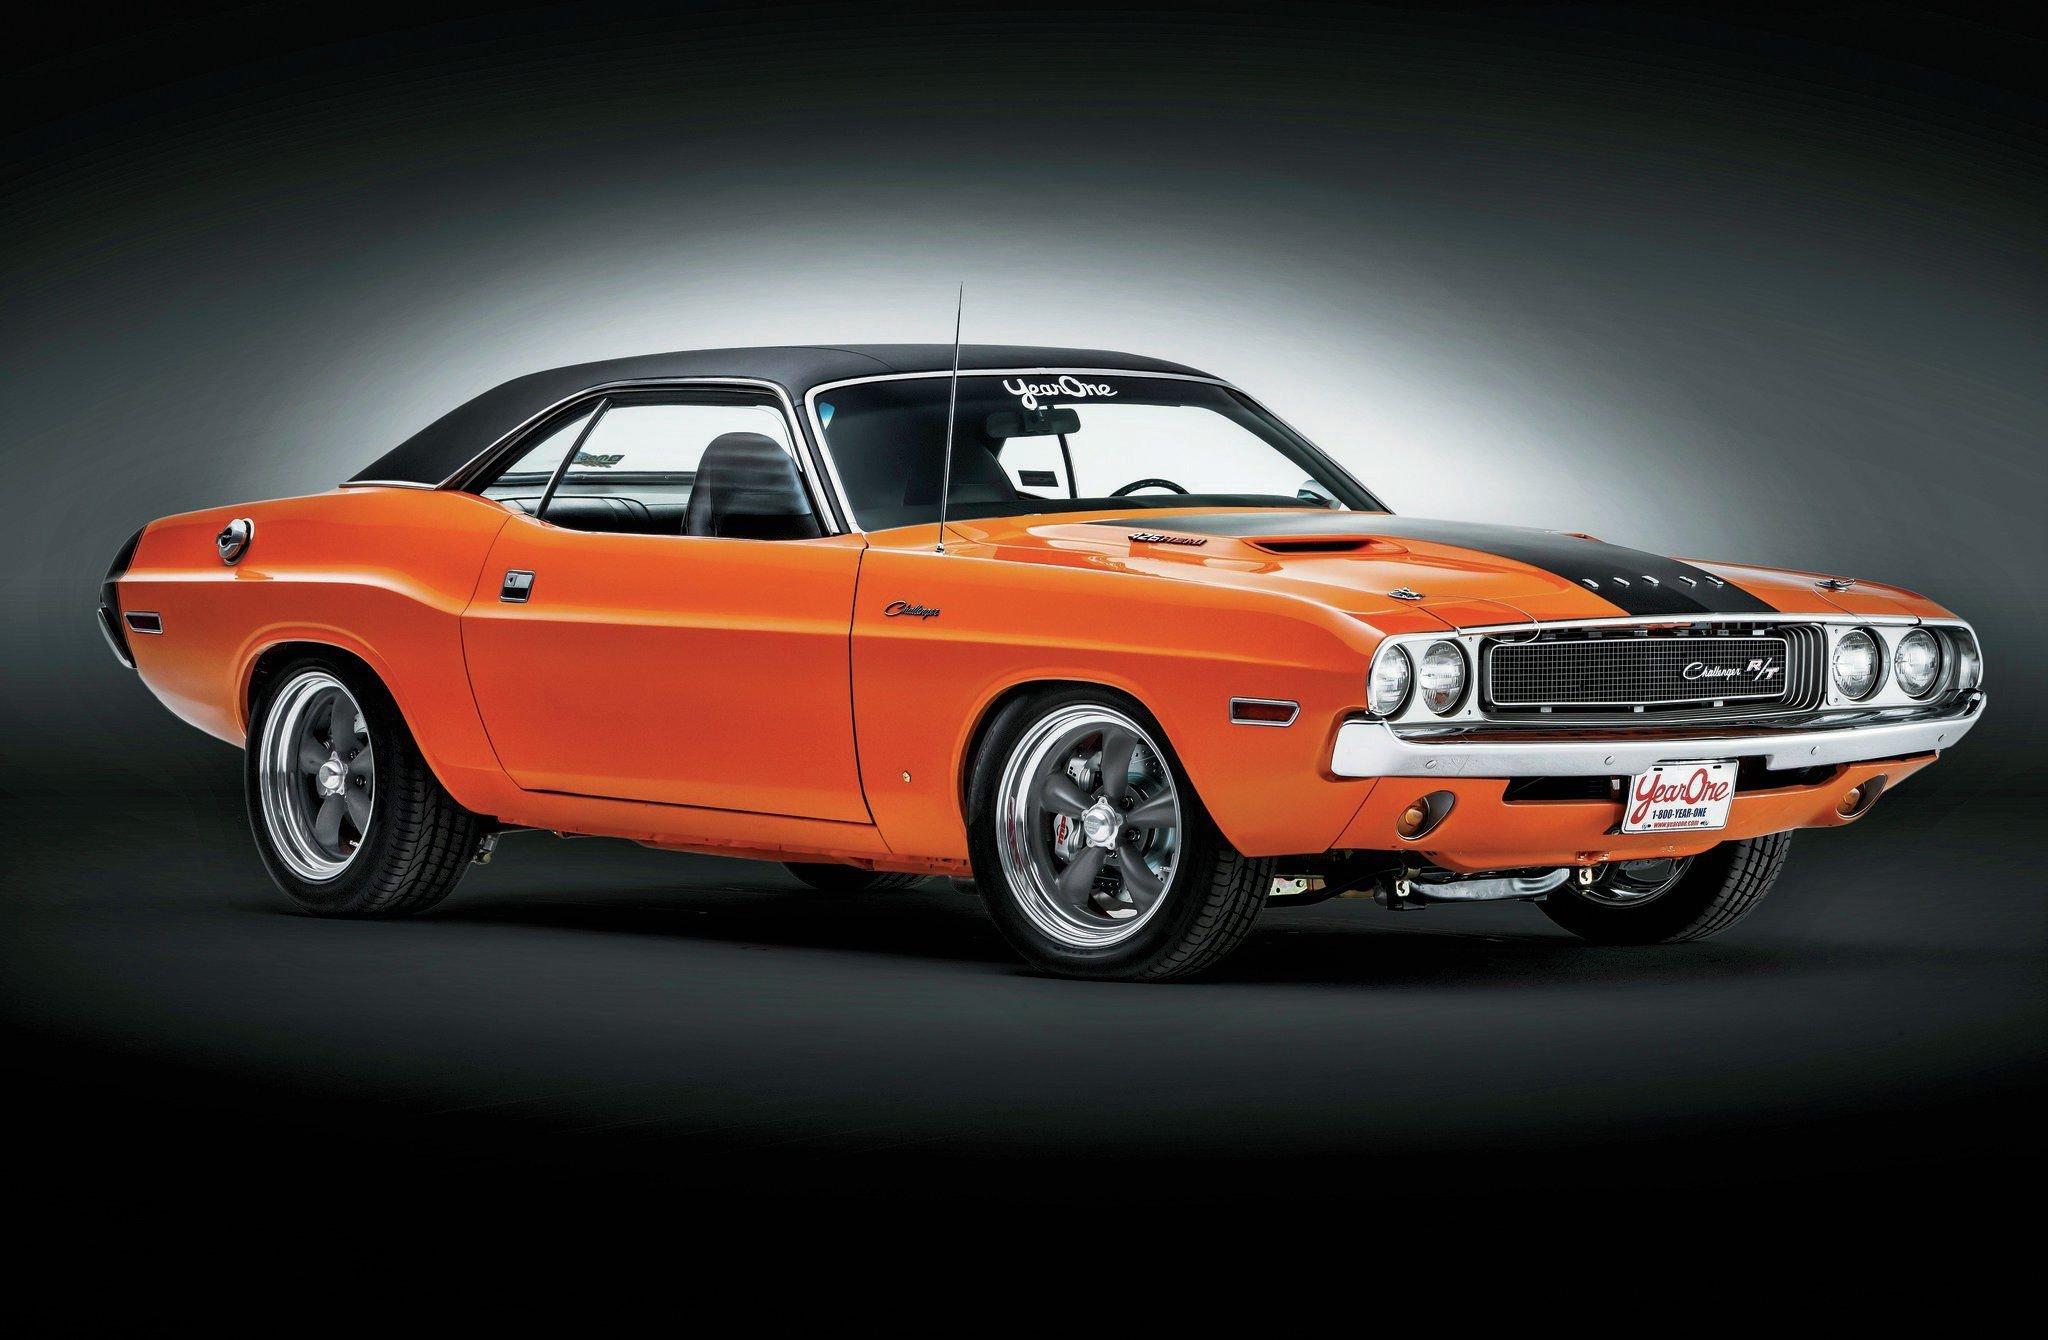 1970 Dodge Challenger RT-01 wallpaper